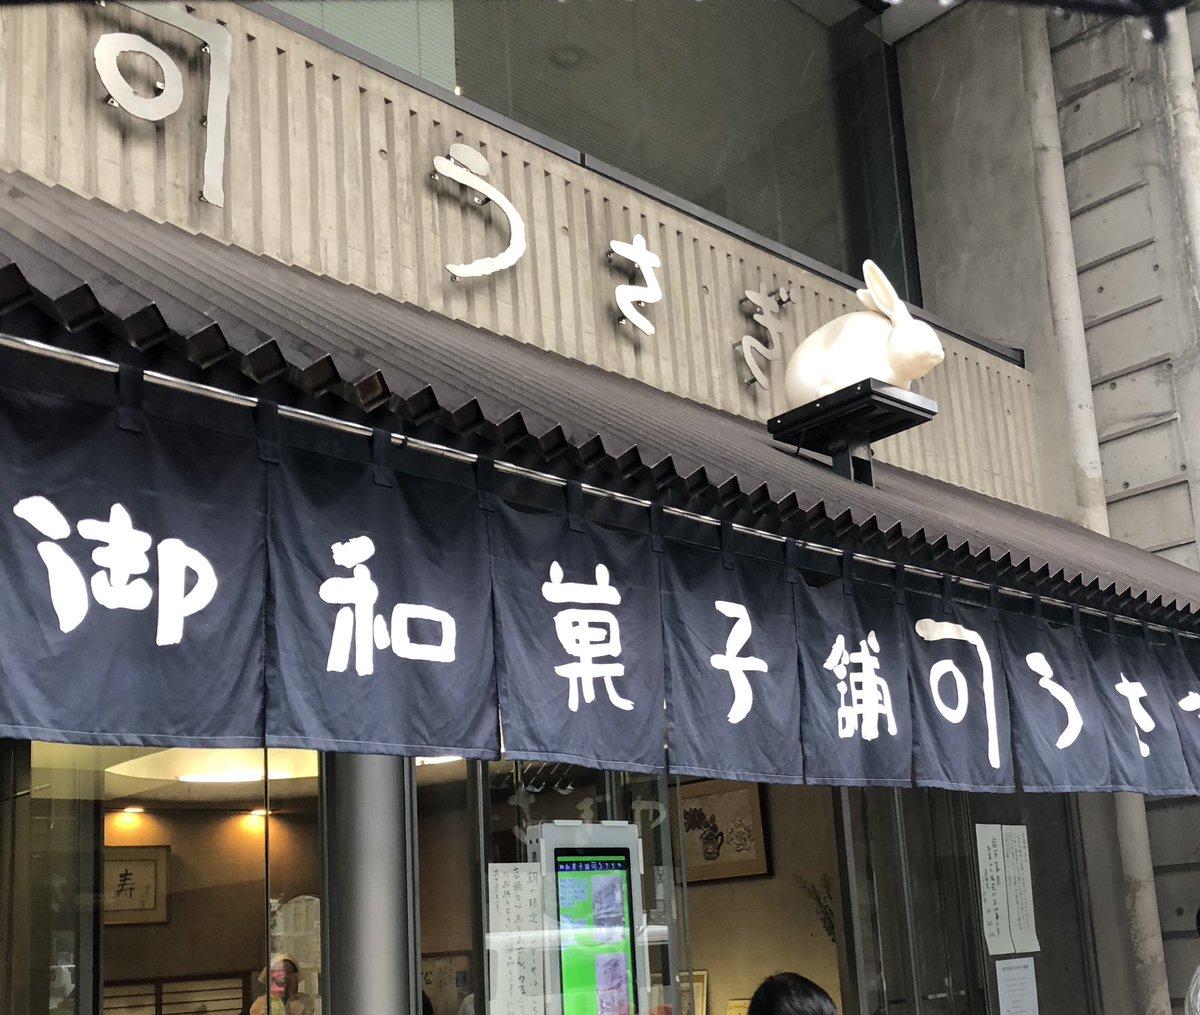 test ツイッターメディア - 東京三大どら焼き であるところの うさぎやさんで どら焼き買って寄席へ  始まる前に完食しちゃいました😋 前から 草月さんの黒松も大好物!  三大どら焼き残るはひとーつっ! 浅草 亀十行くぞ #どら焼き #東京三大どら焼き  #きょうのあんこ https://t.co/M2ePrcv4vz